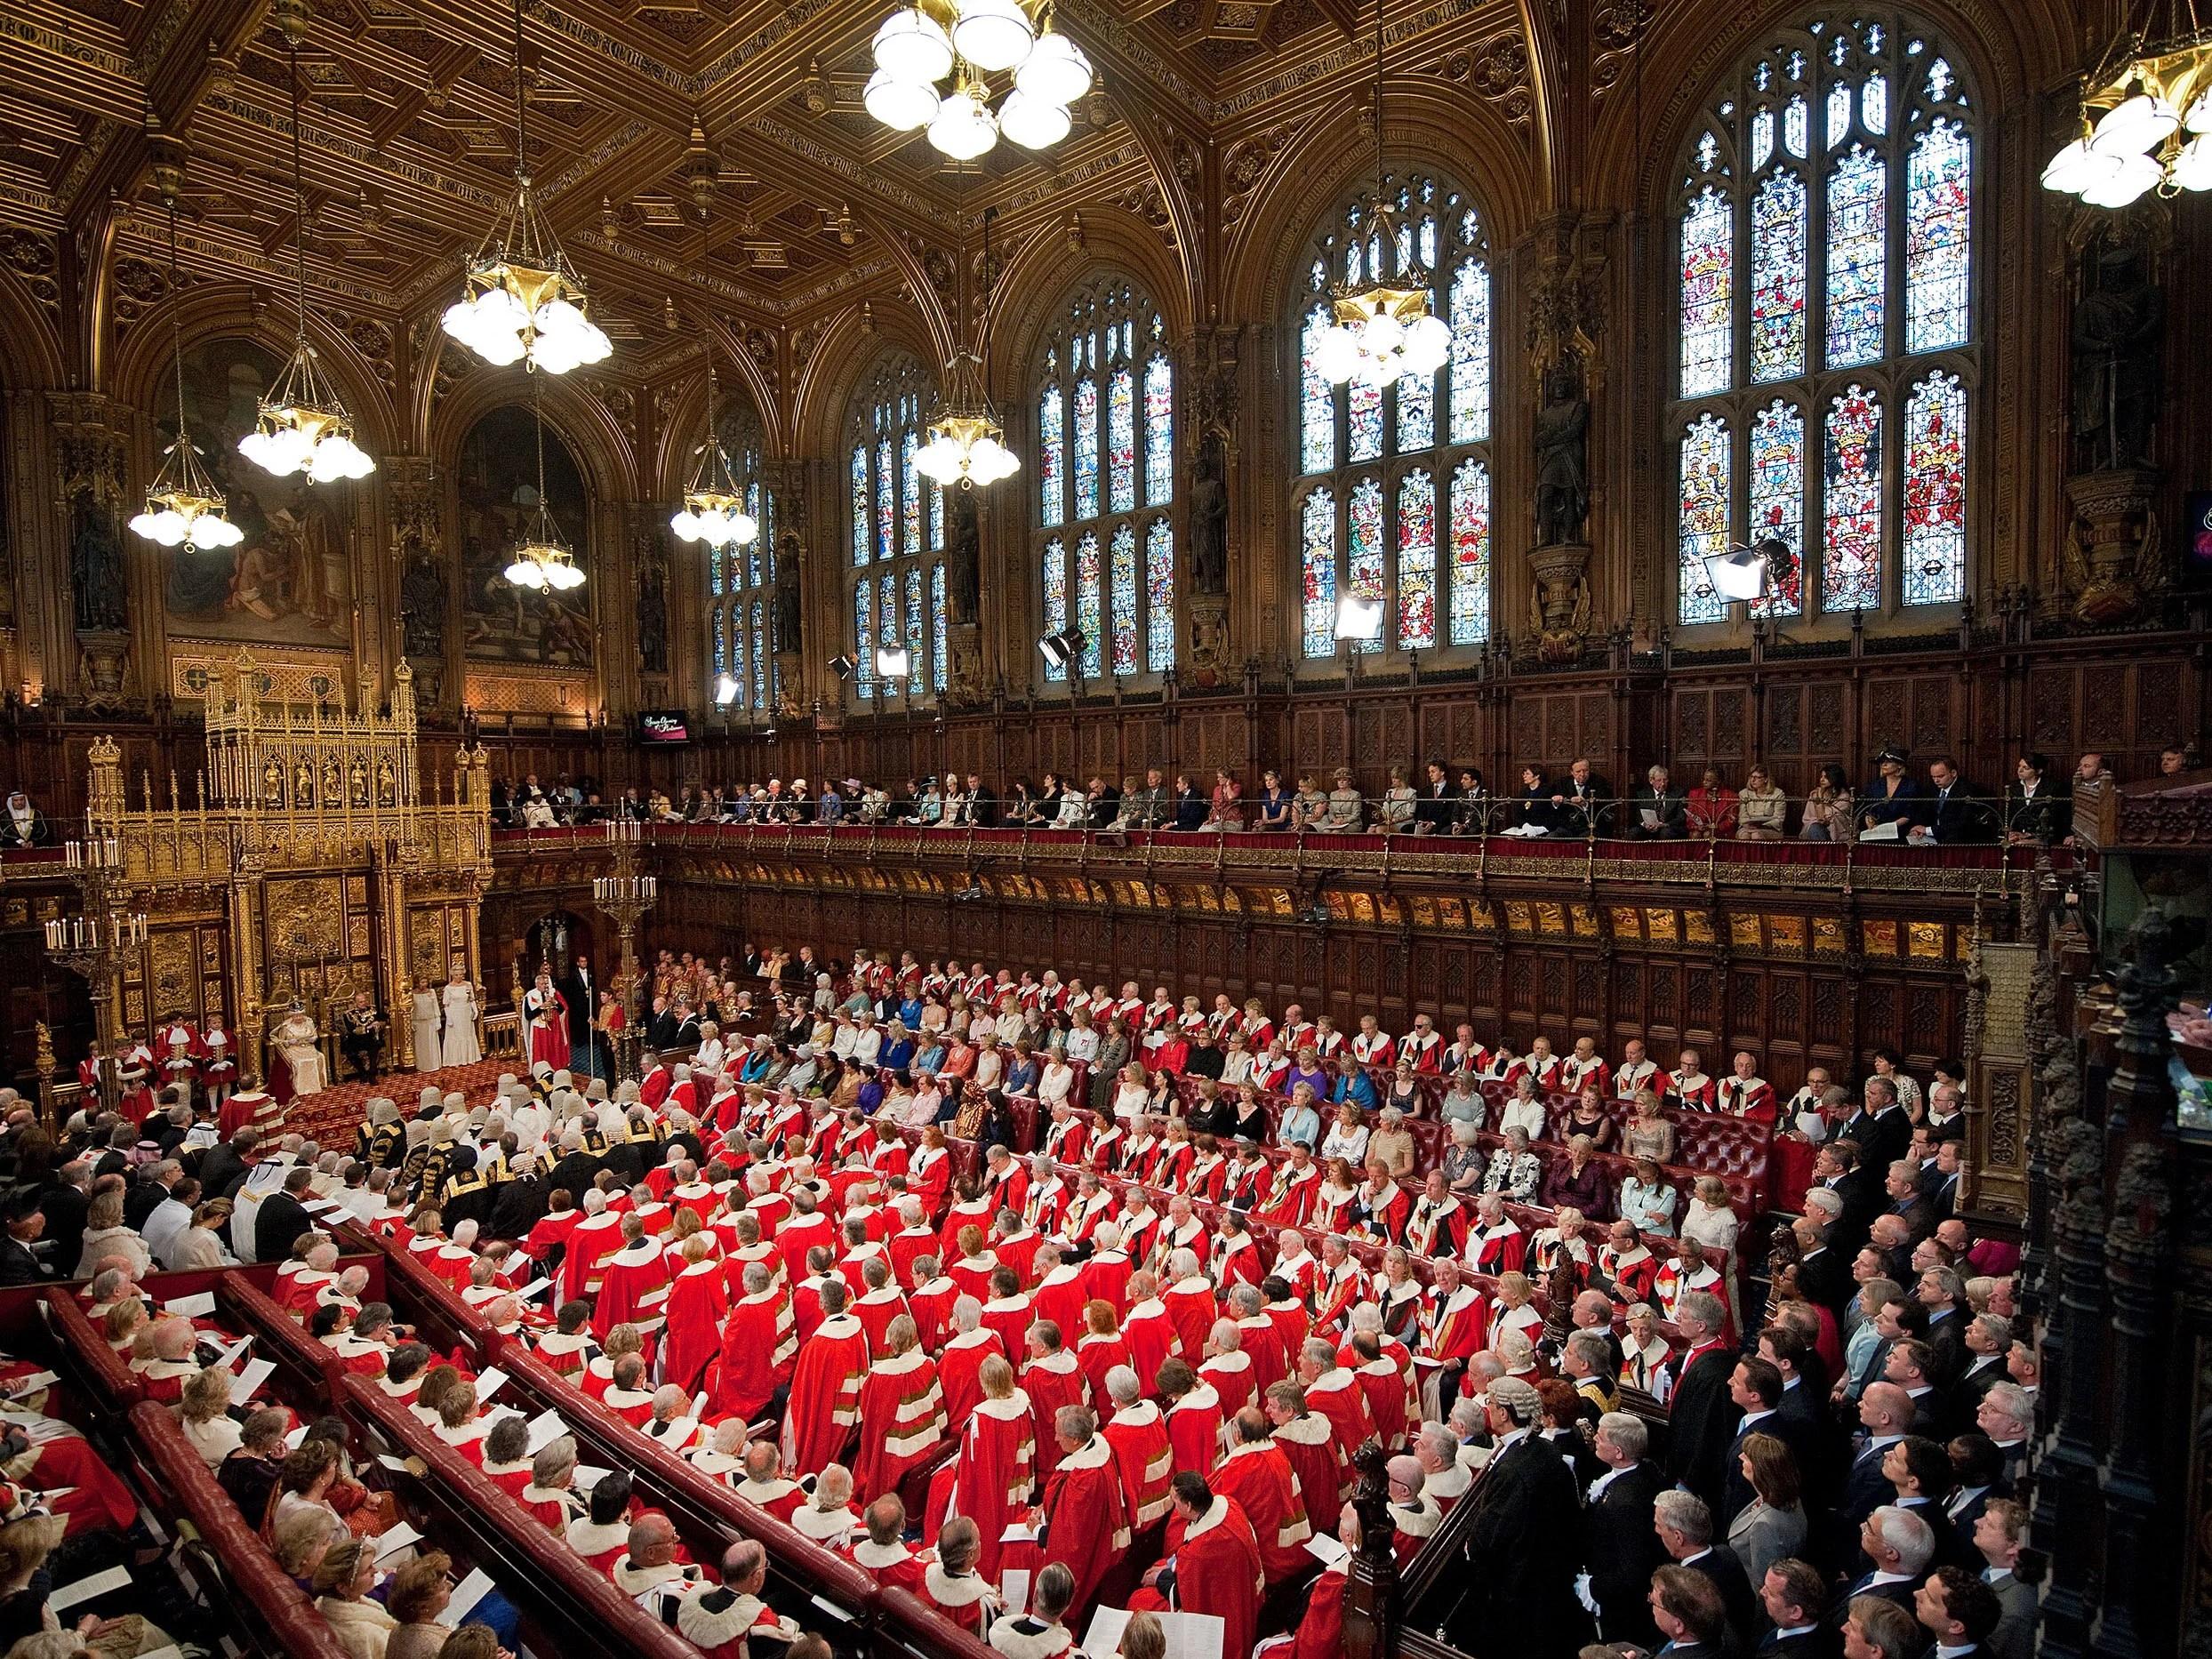 Boris Johnson considers moving House of Lords to York